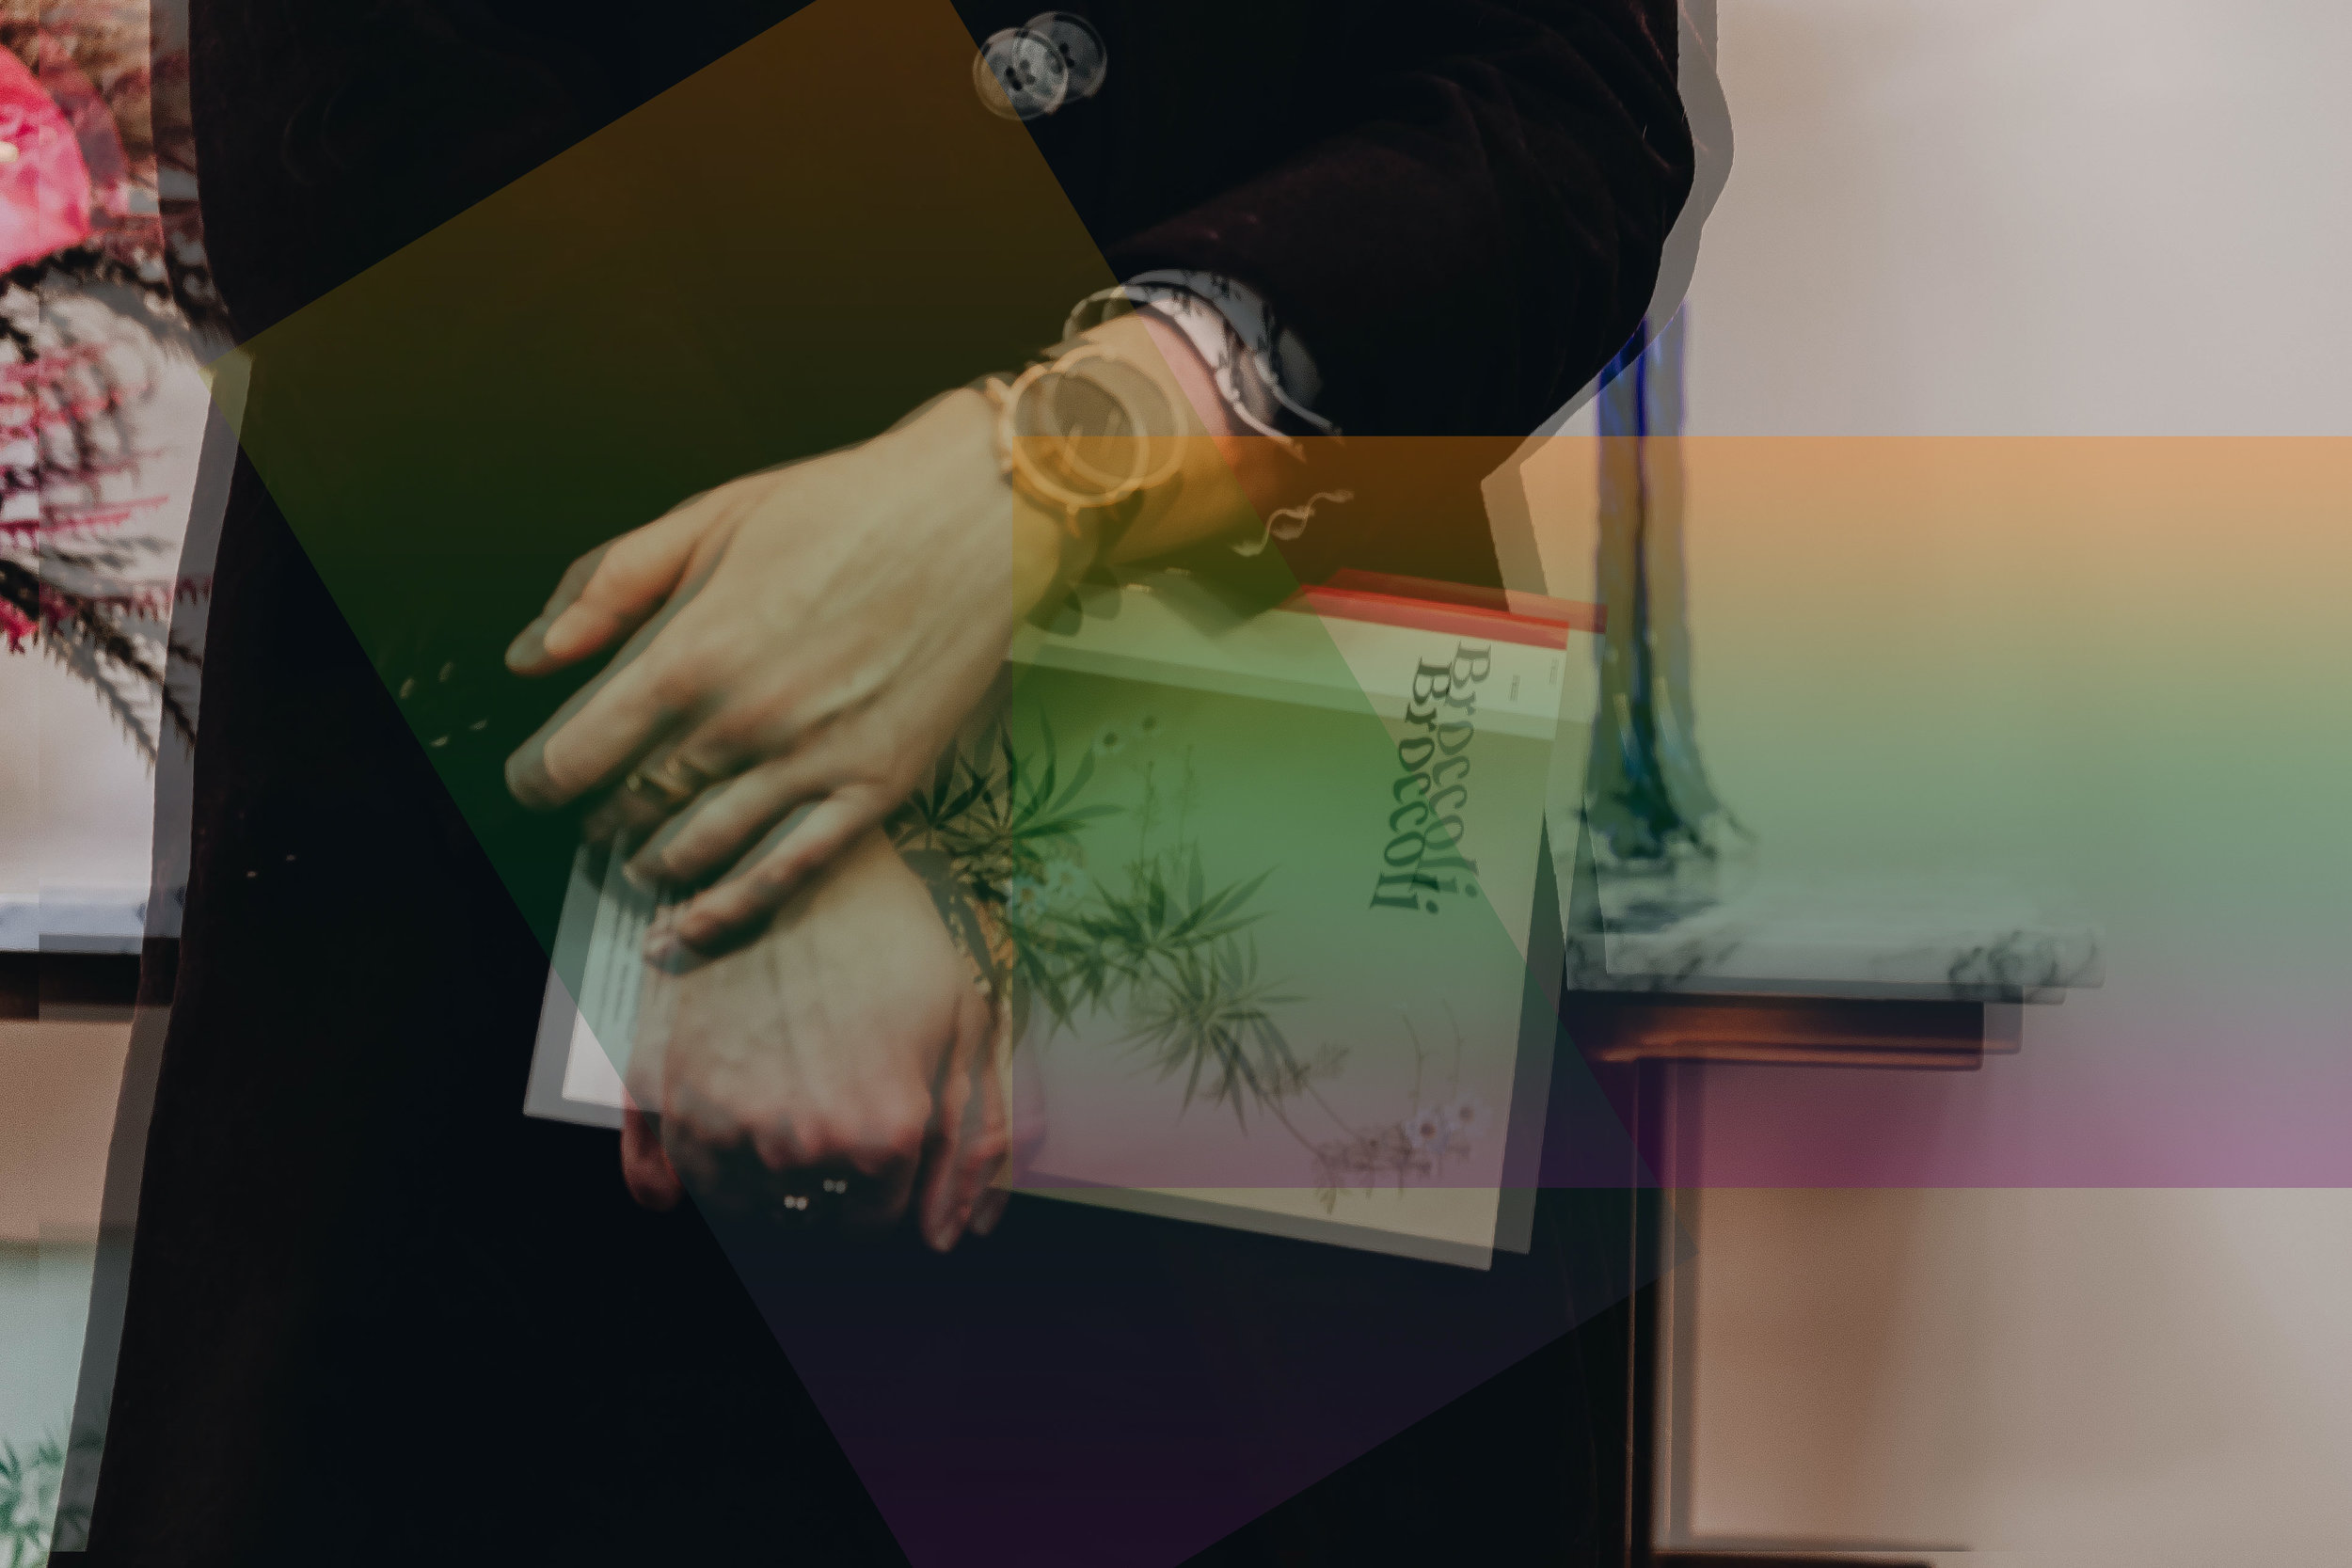 BROCCOLI MAGAZINE LAUNCH PARTY IN PORTLAND / PHOTO CREDIT:  RICK COVEY  / DESIGN CREDIT:  VANESSA ACOSTA